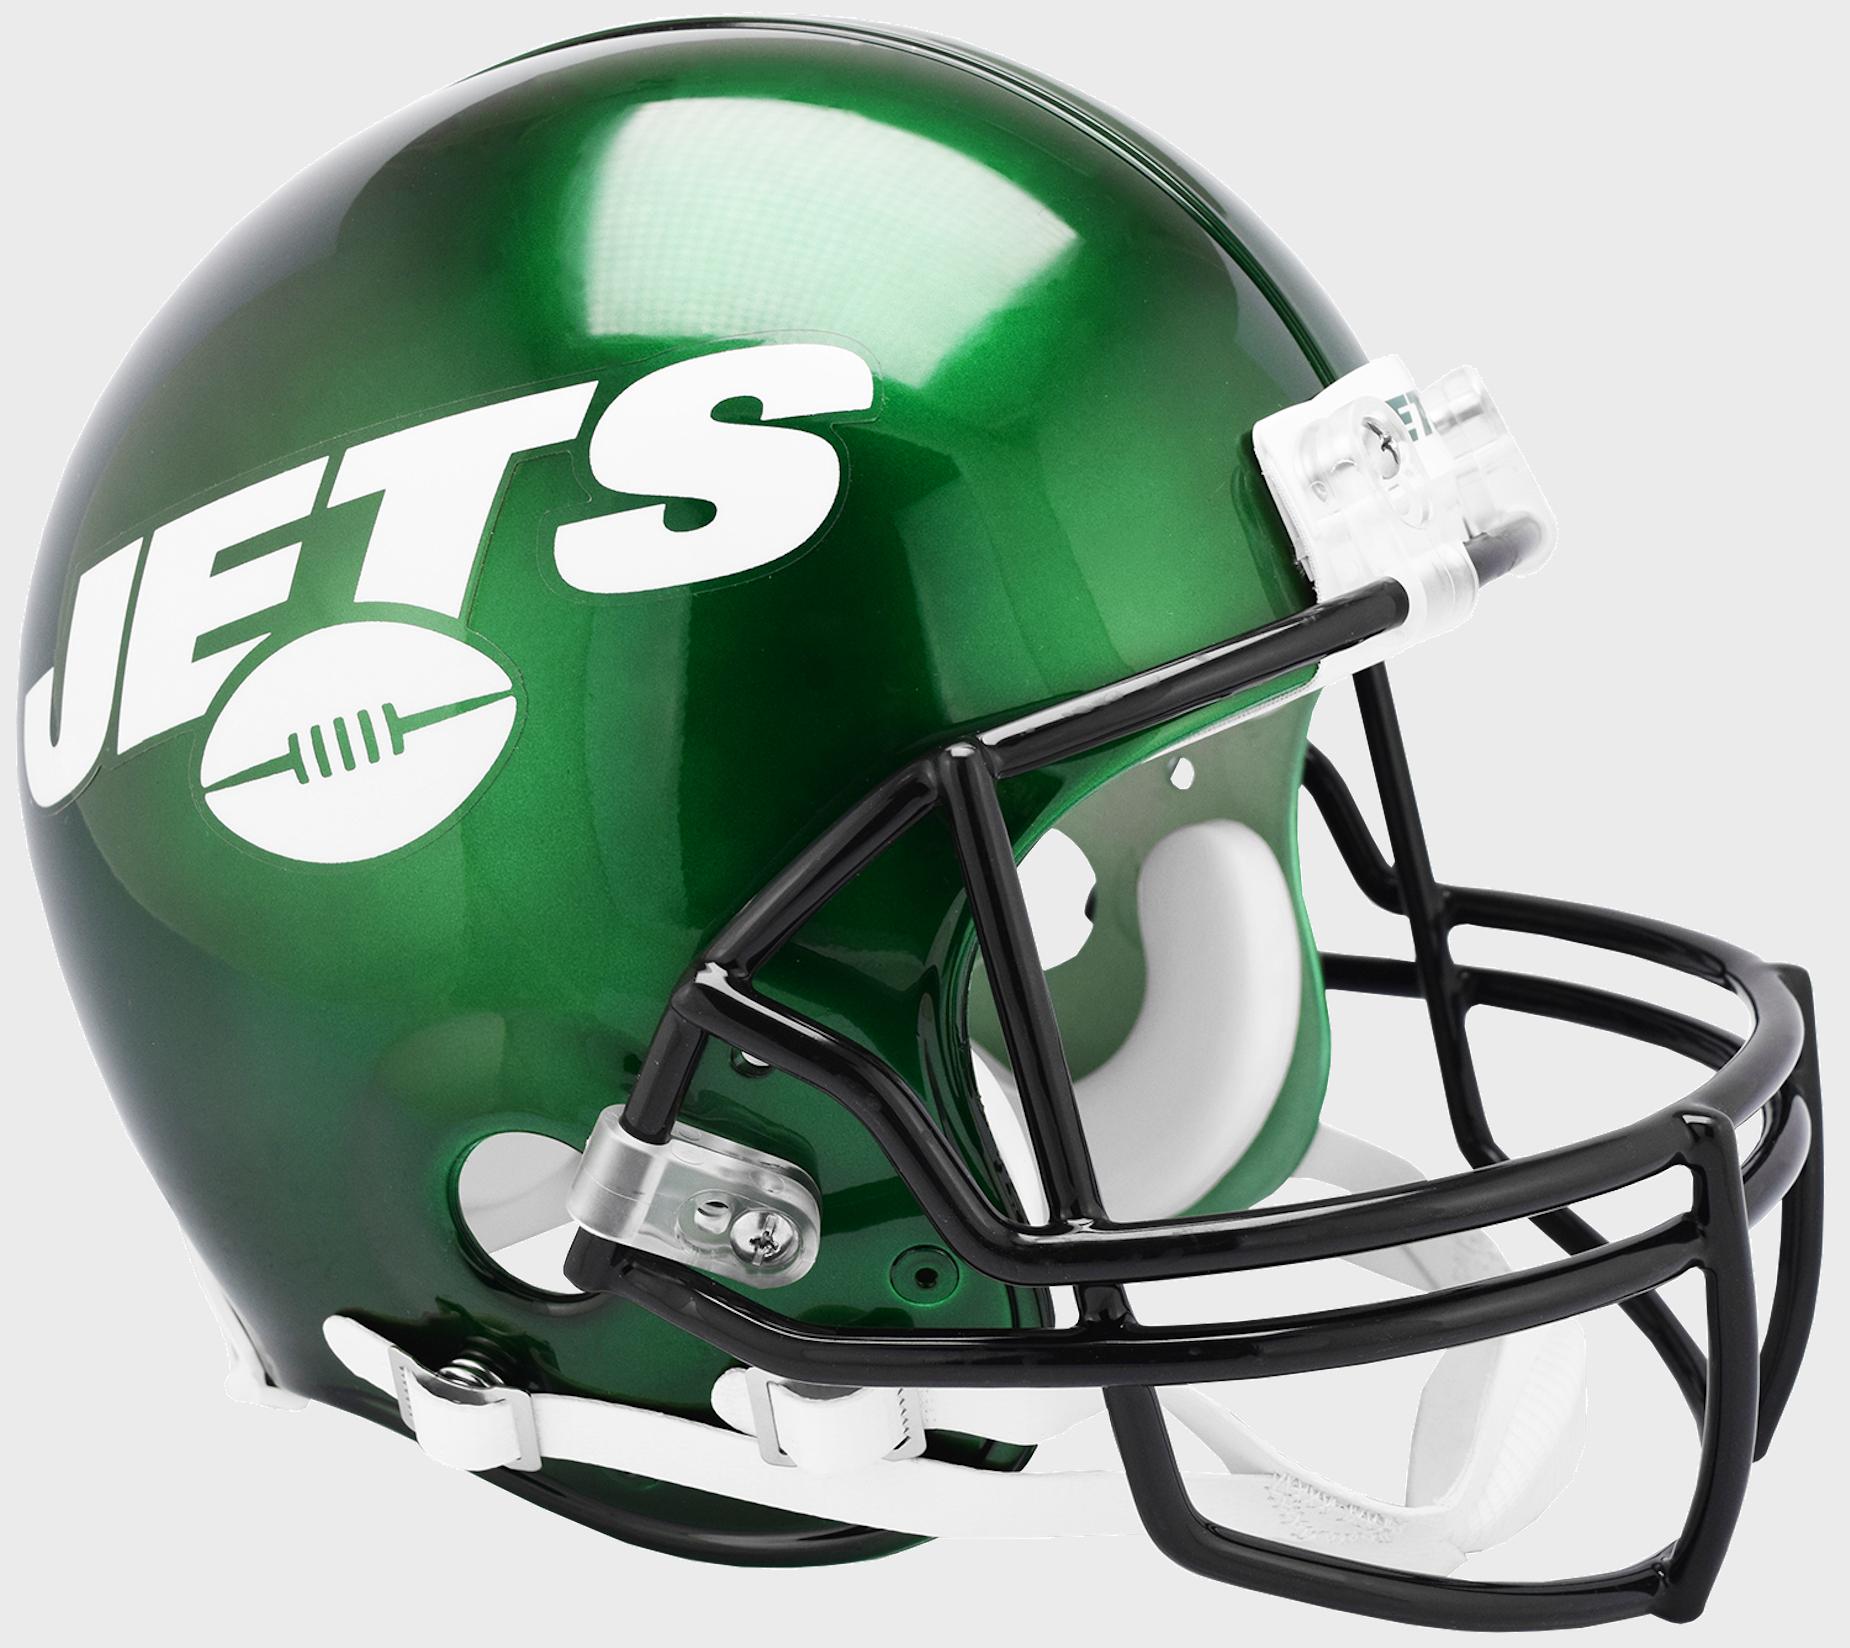 New York Jets Football Helmet <B>2019</B>